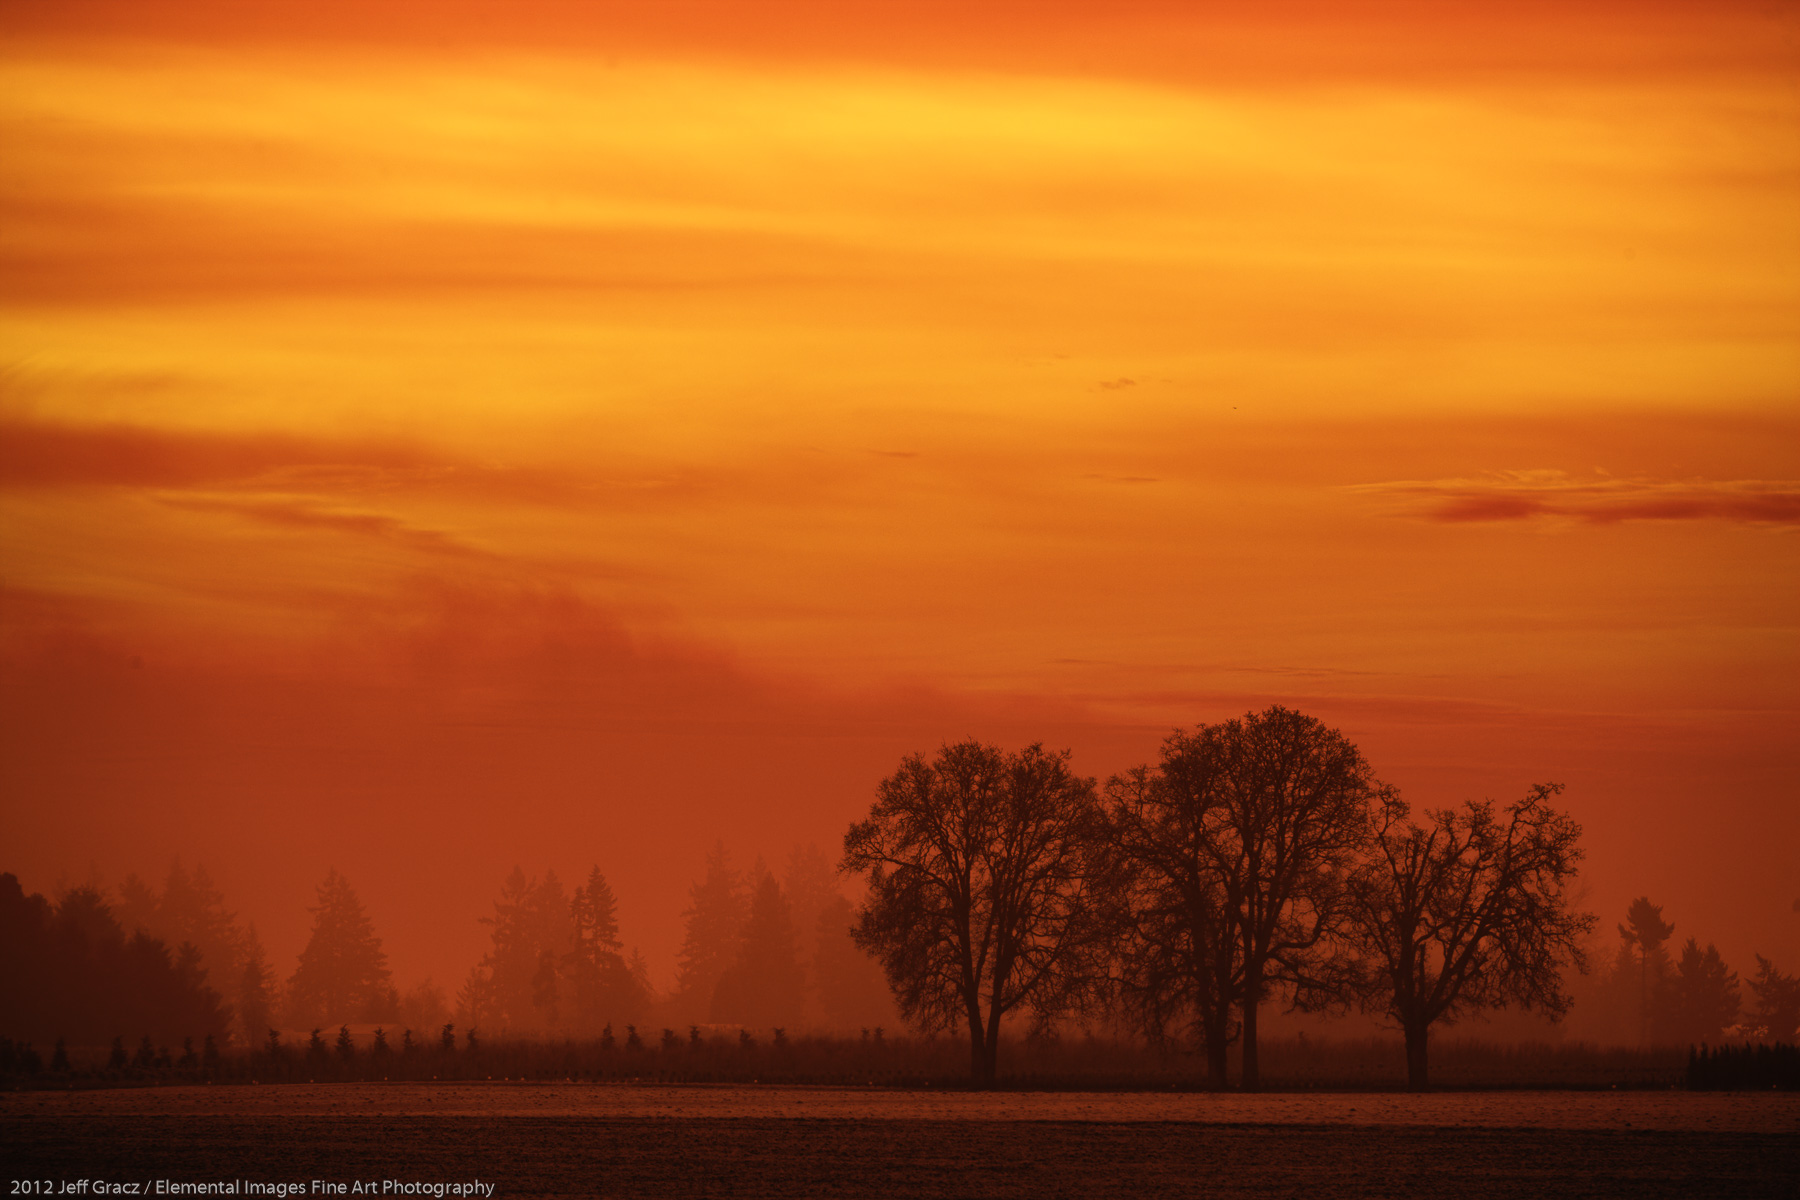 Fog, Sunrise, Willamette Vallye | Butteville | OR | USA - © 2012 Jeff Gracz / Elemental Images Fine Art Photography - All Rights Reserved Worldwide